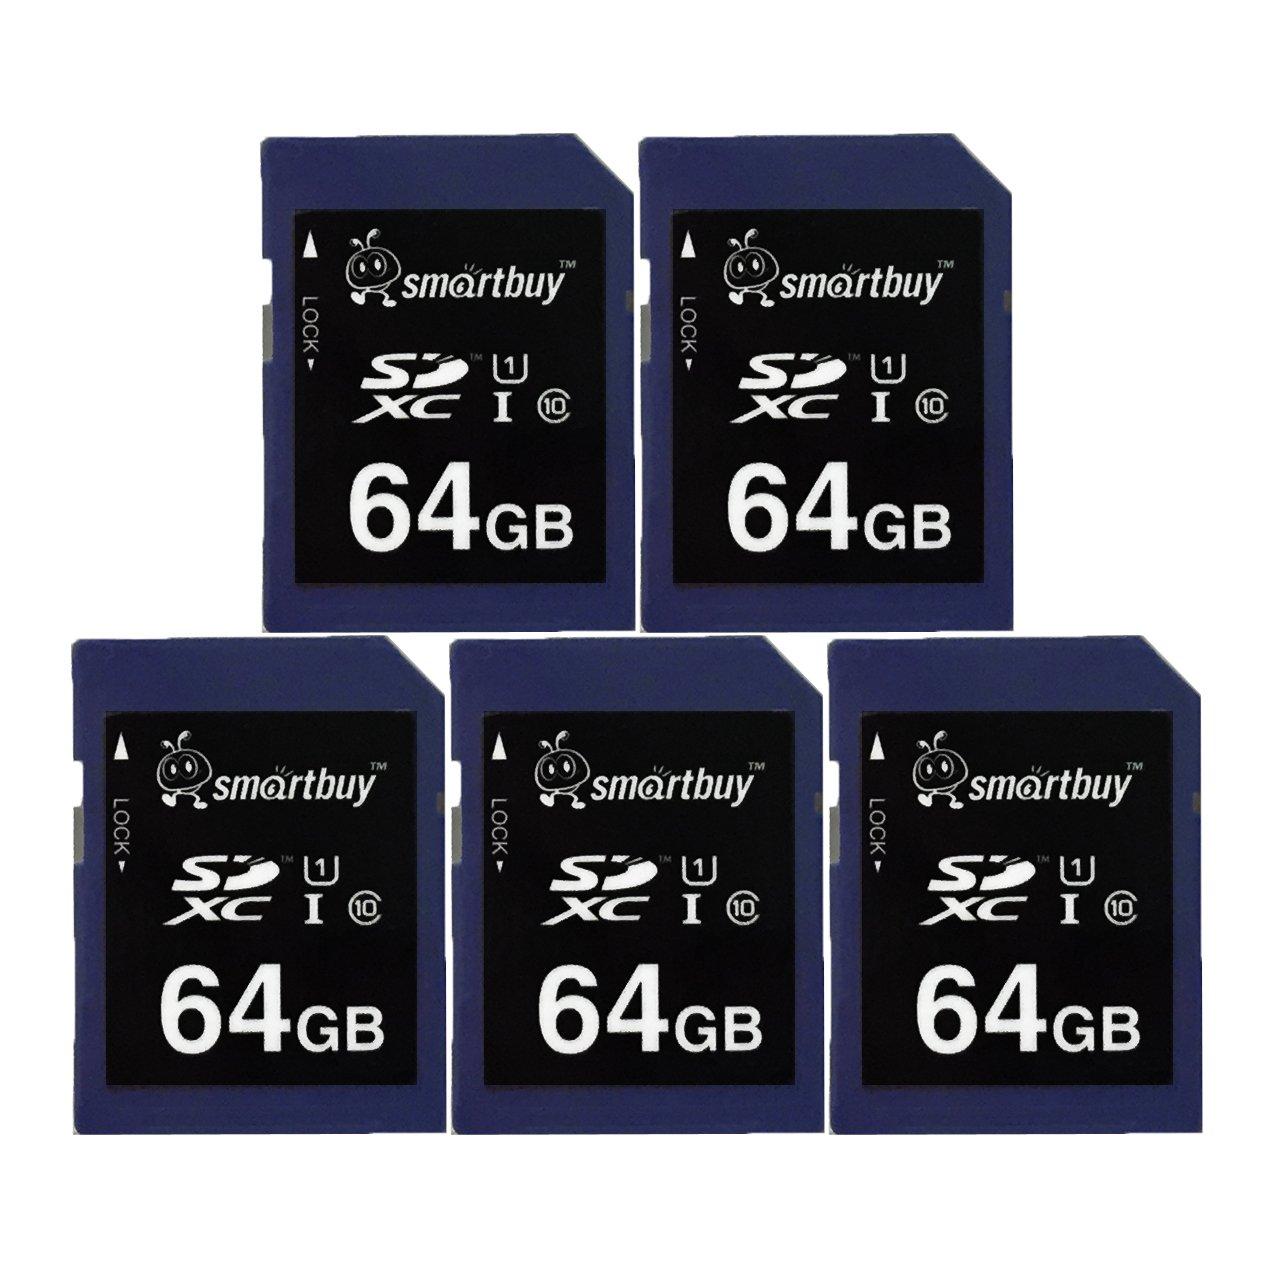 Smart Buy SD XC Class 10 Memory Card SDXC C10 Ultra U1 UHS-I HD Fast Speed for Camera (64GB (5-Pack))